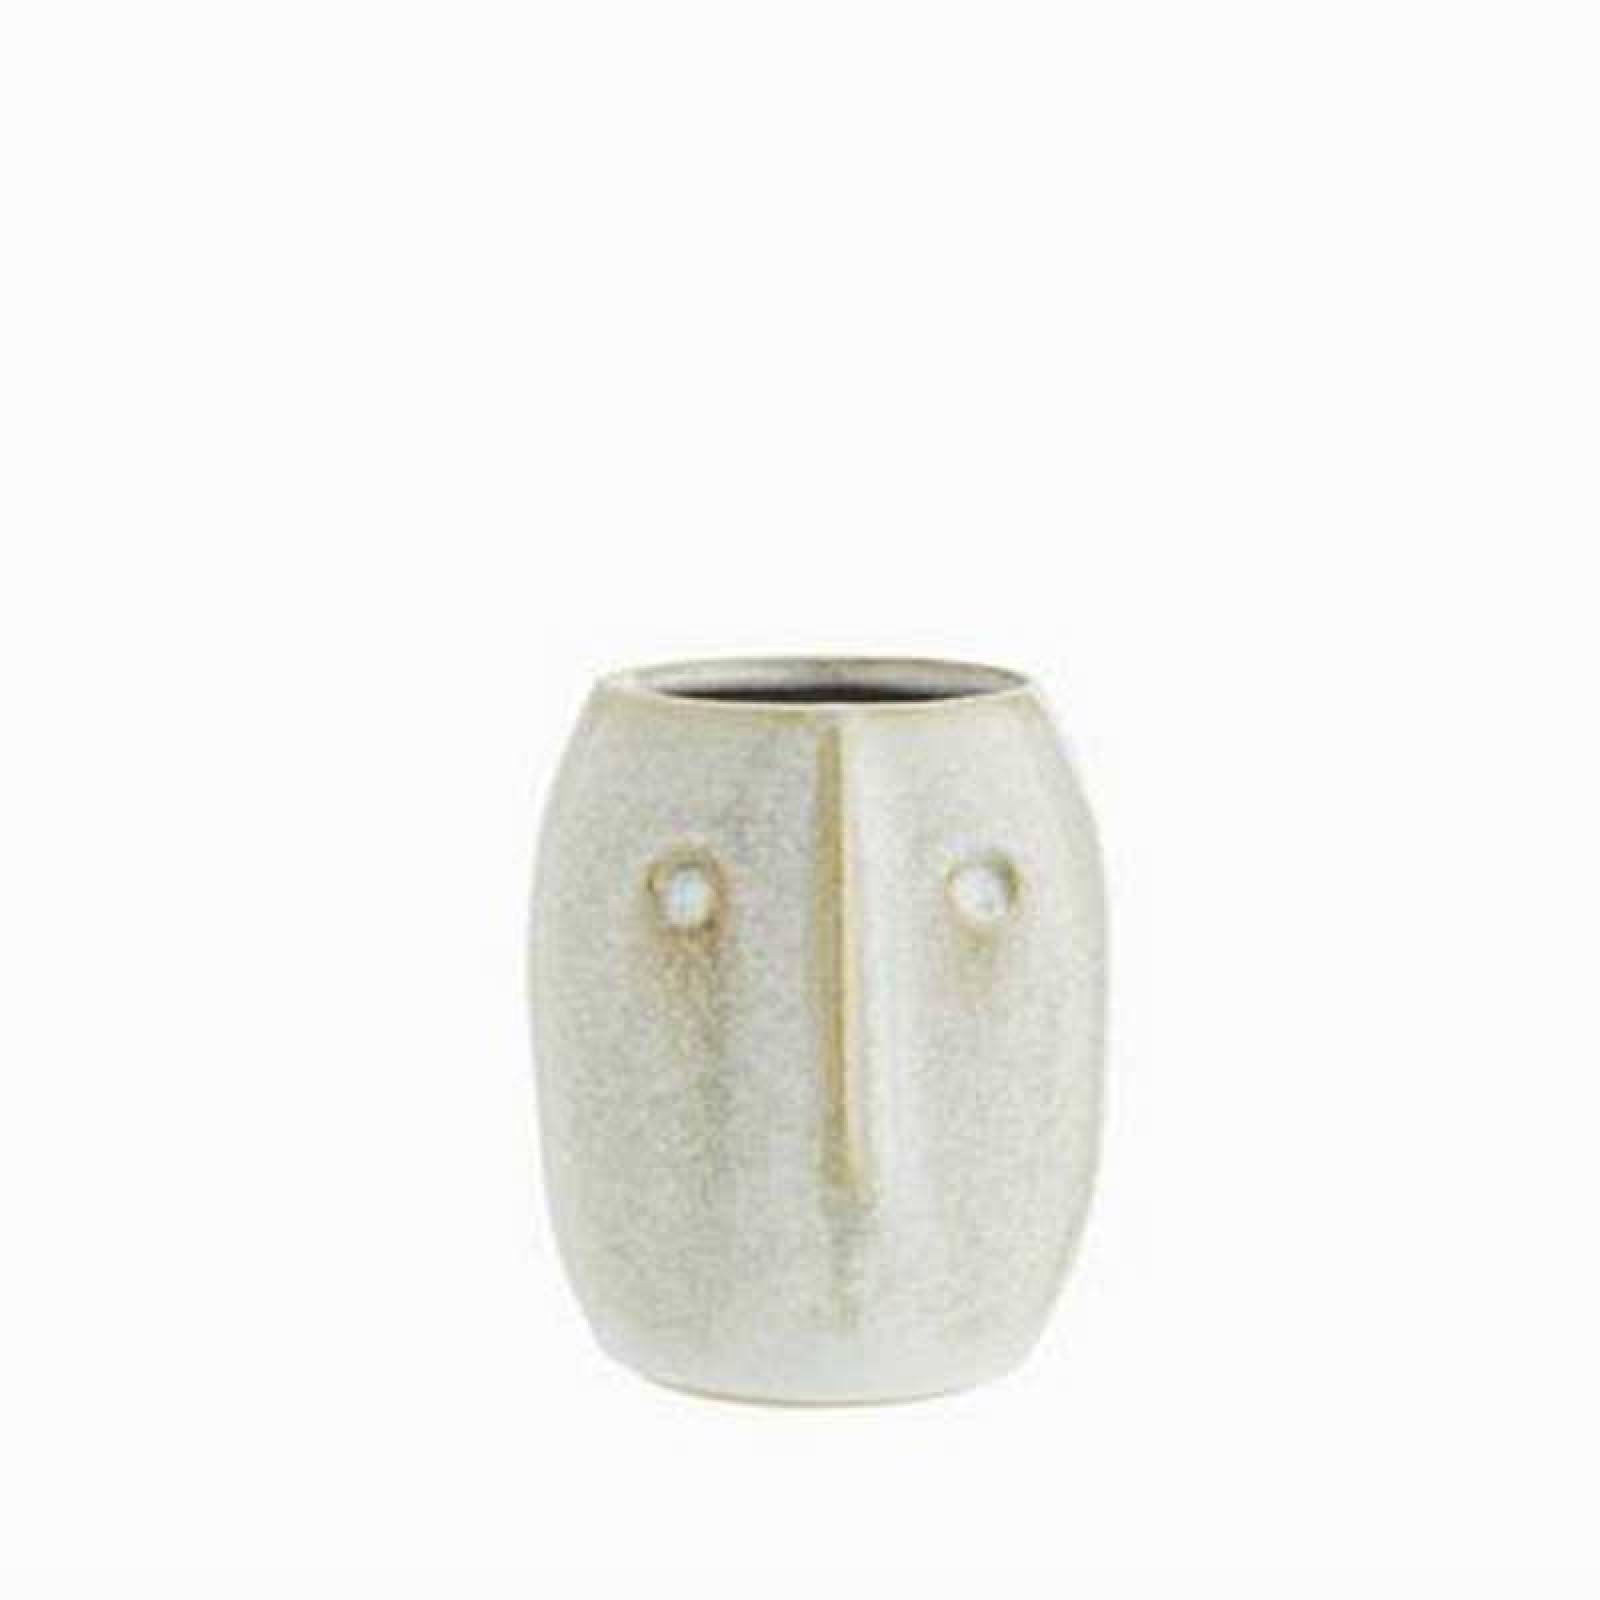 Off White Stoneware Curved Face Vase 10cm thumbnails